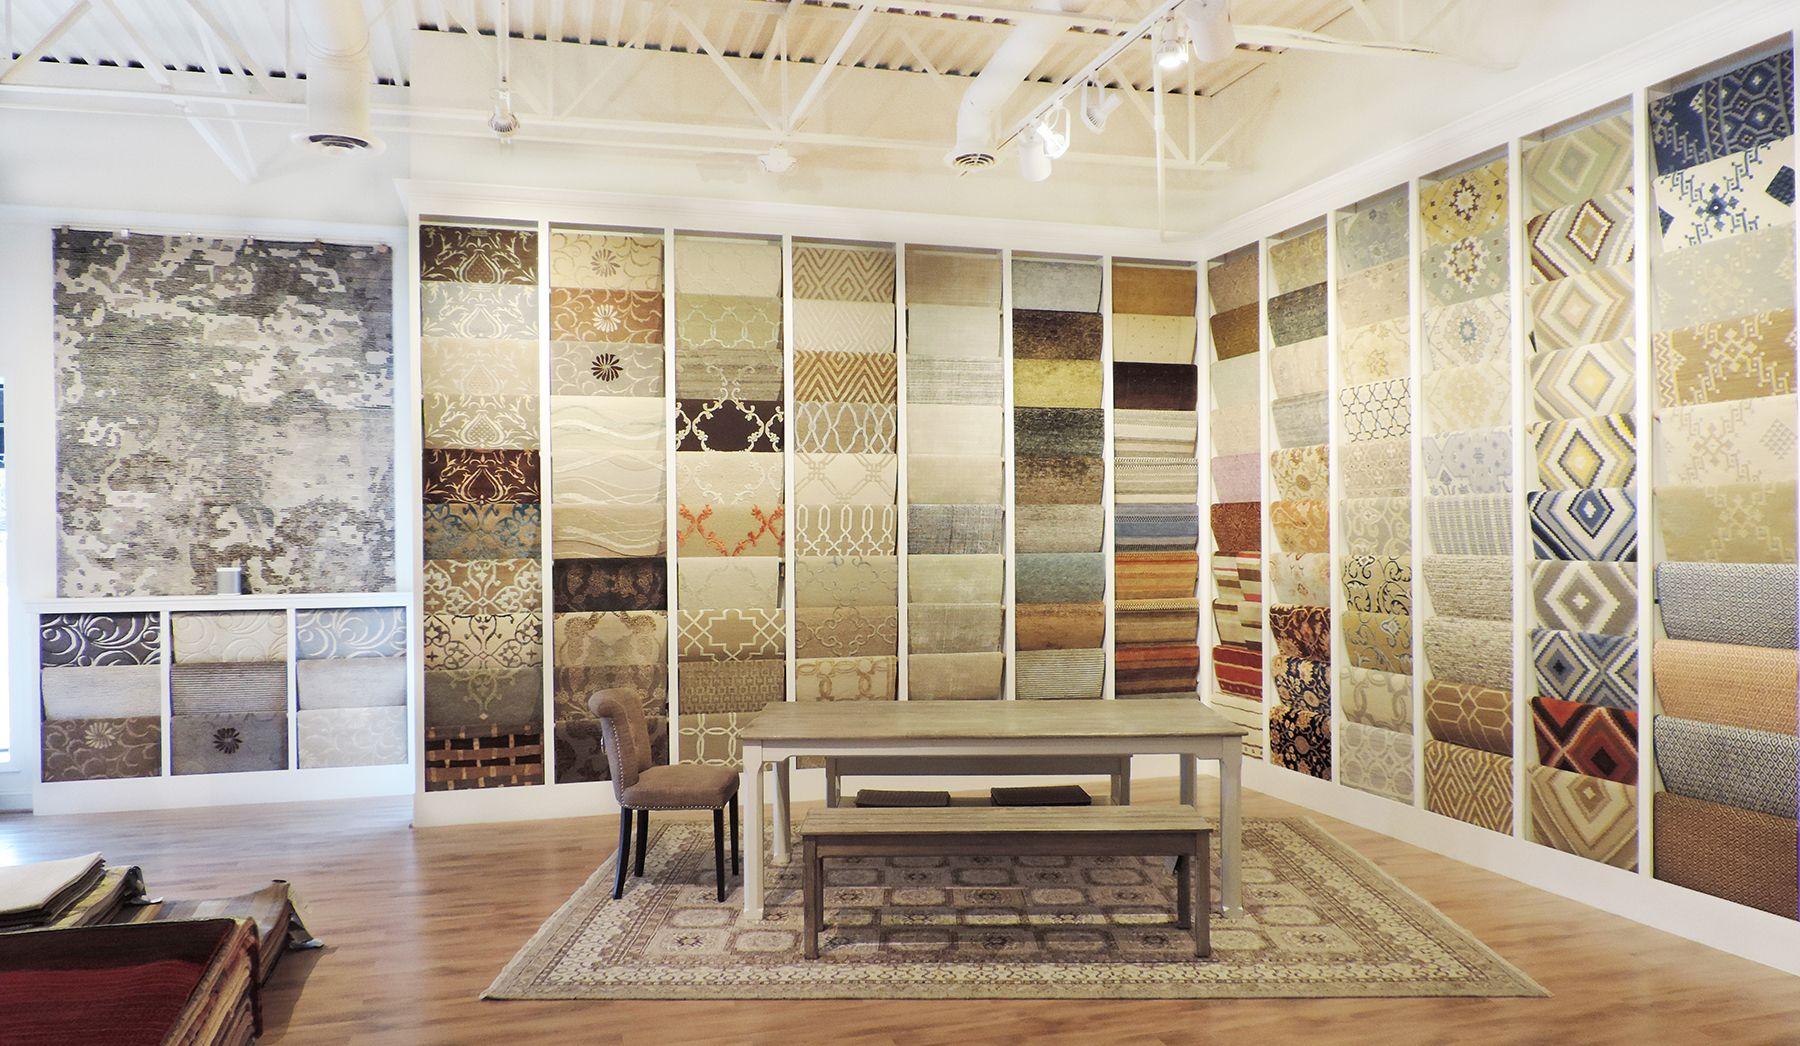 Custom Rug Sample Room Designers Welcome Http Www Sennehknot  # Muebles Adriana Hoyos Quito